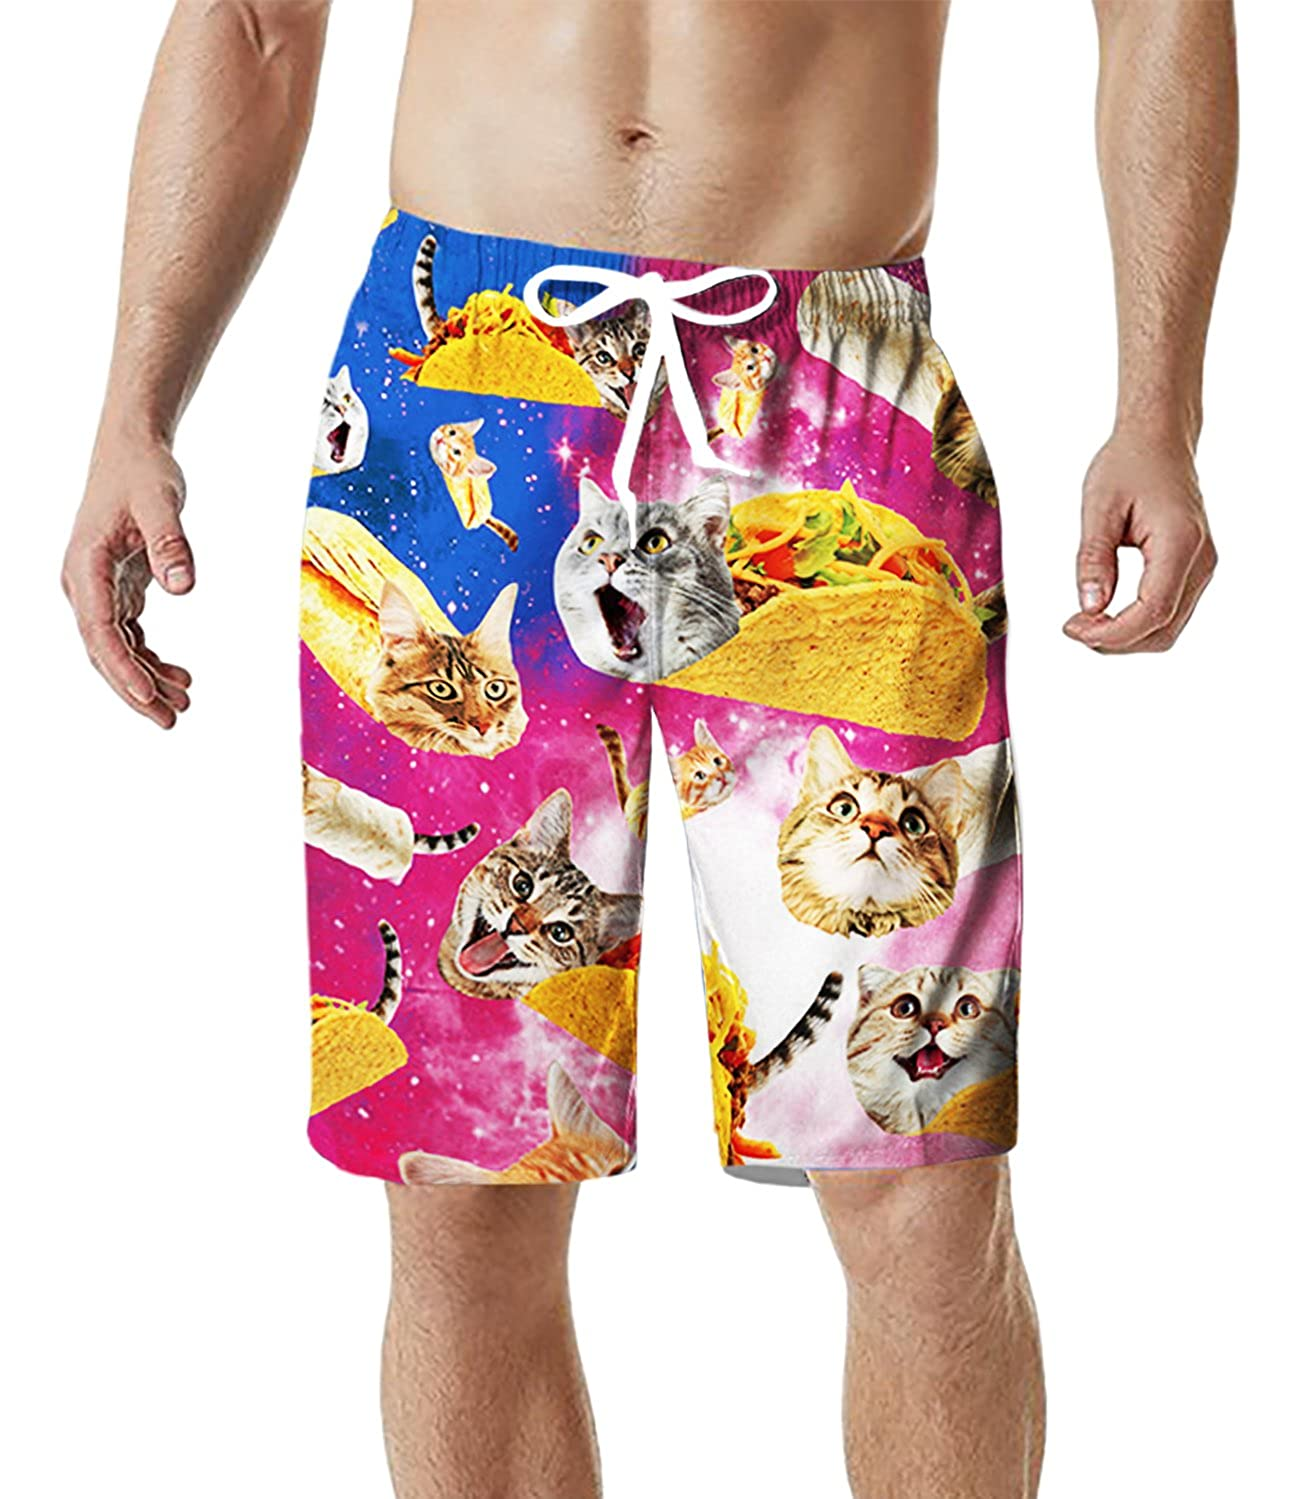 TUONROAD Mens Swimming Trunks 3D Print Pineapple Cat Shark Funny Pattern Swim Shorts Quick Drying Holiday Beach Shorts Lightweight Swimwear Surf Board Shorts with Mesh Lining S XXL